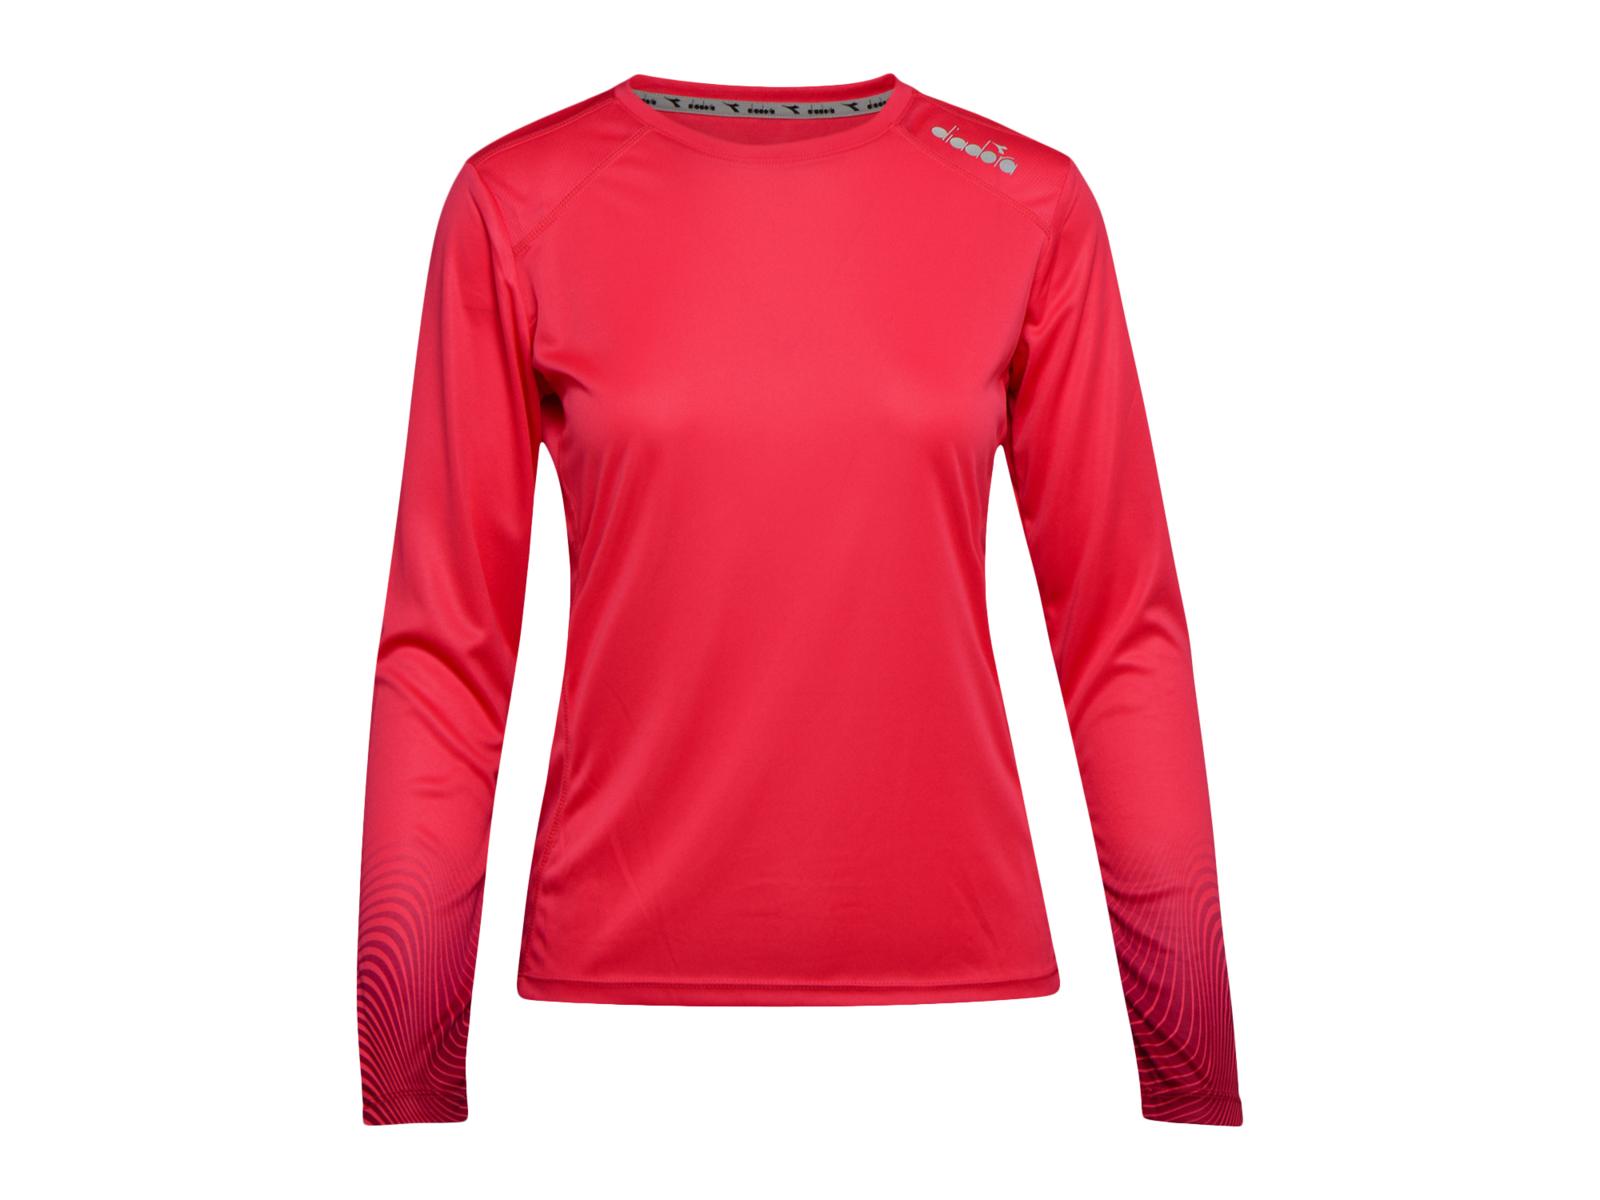 Diadora L. X Run LS T Shirt Lange ærmer t shirt Dame Rød (DKK 51,60)